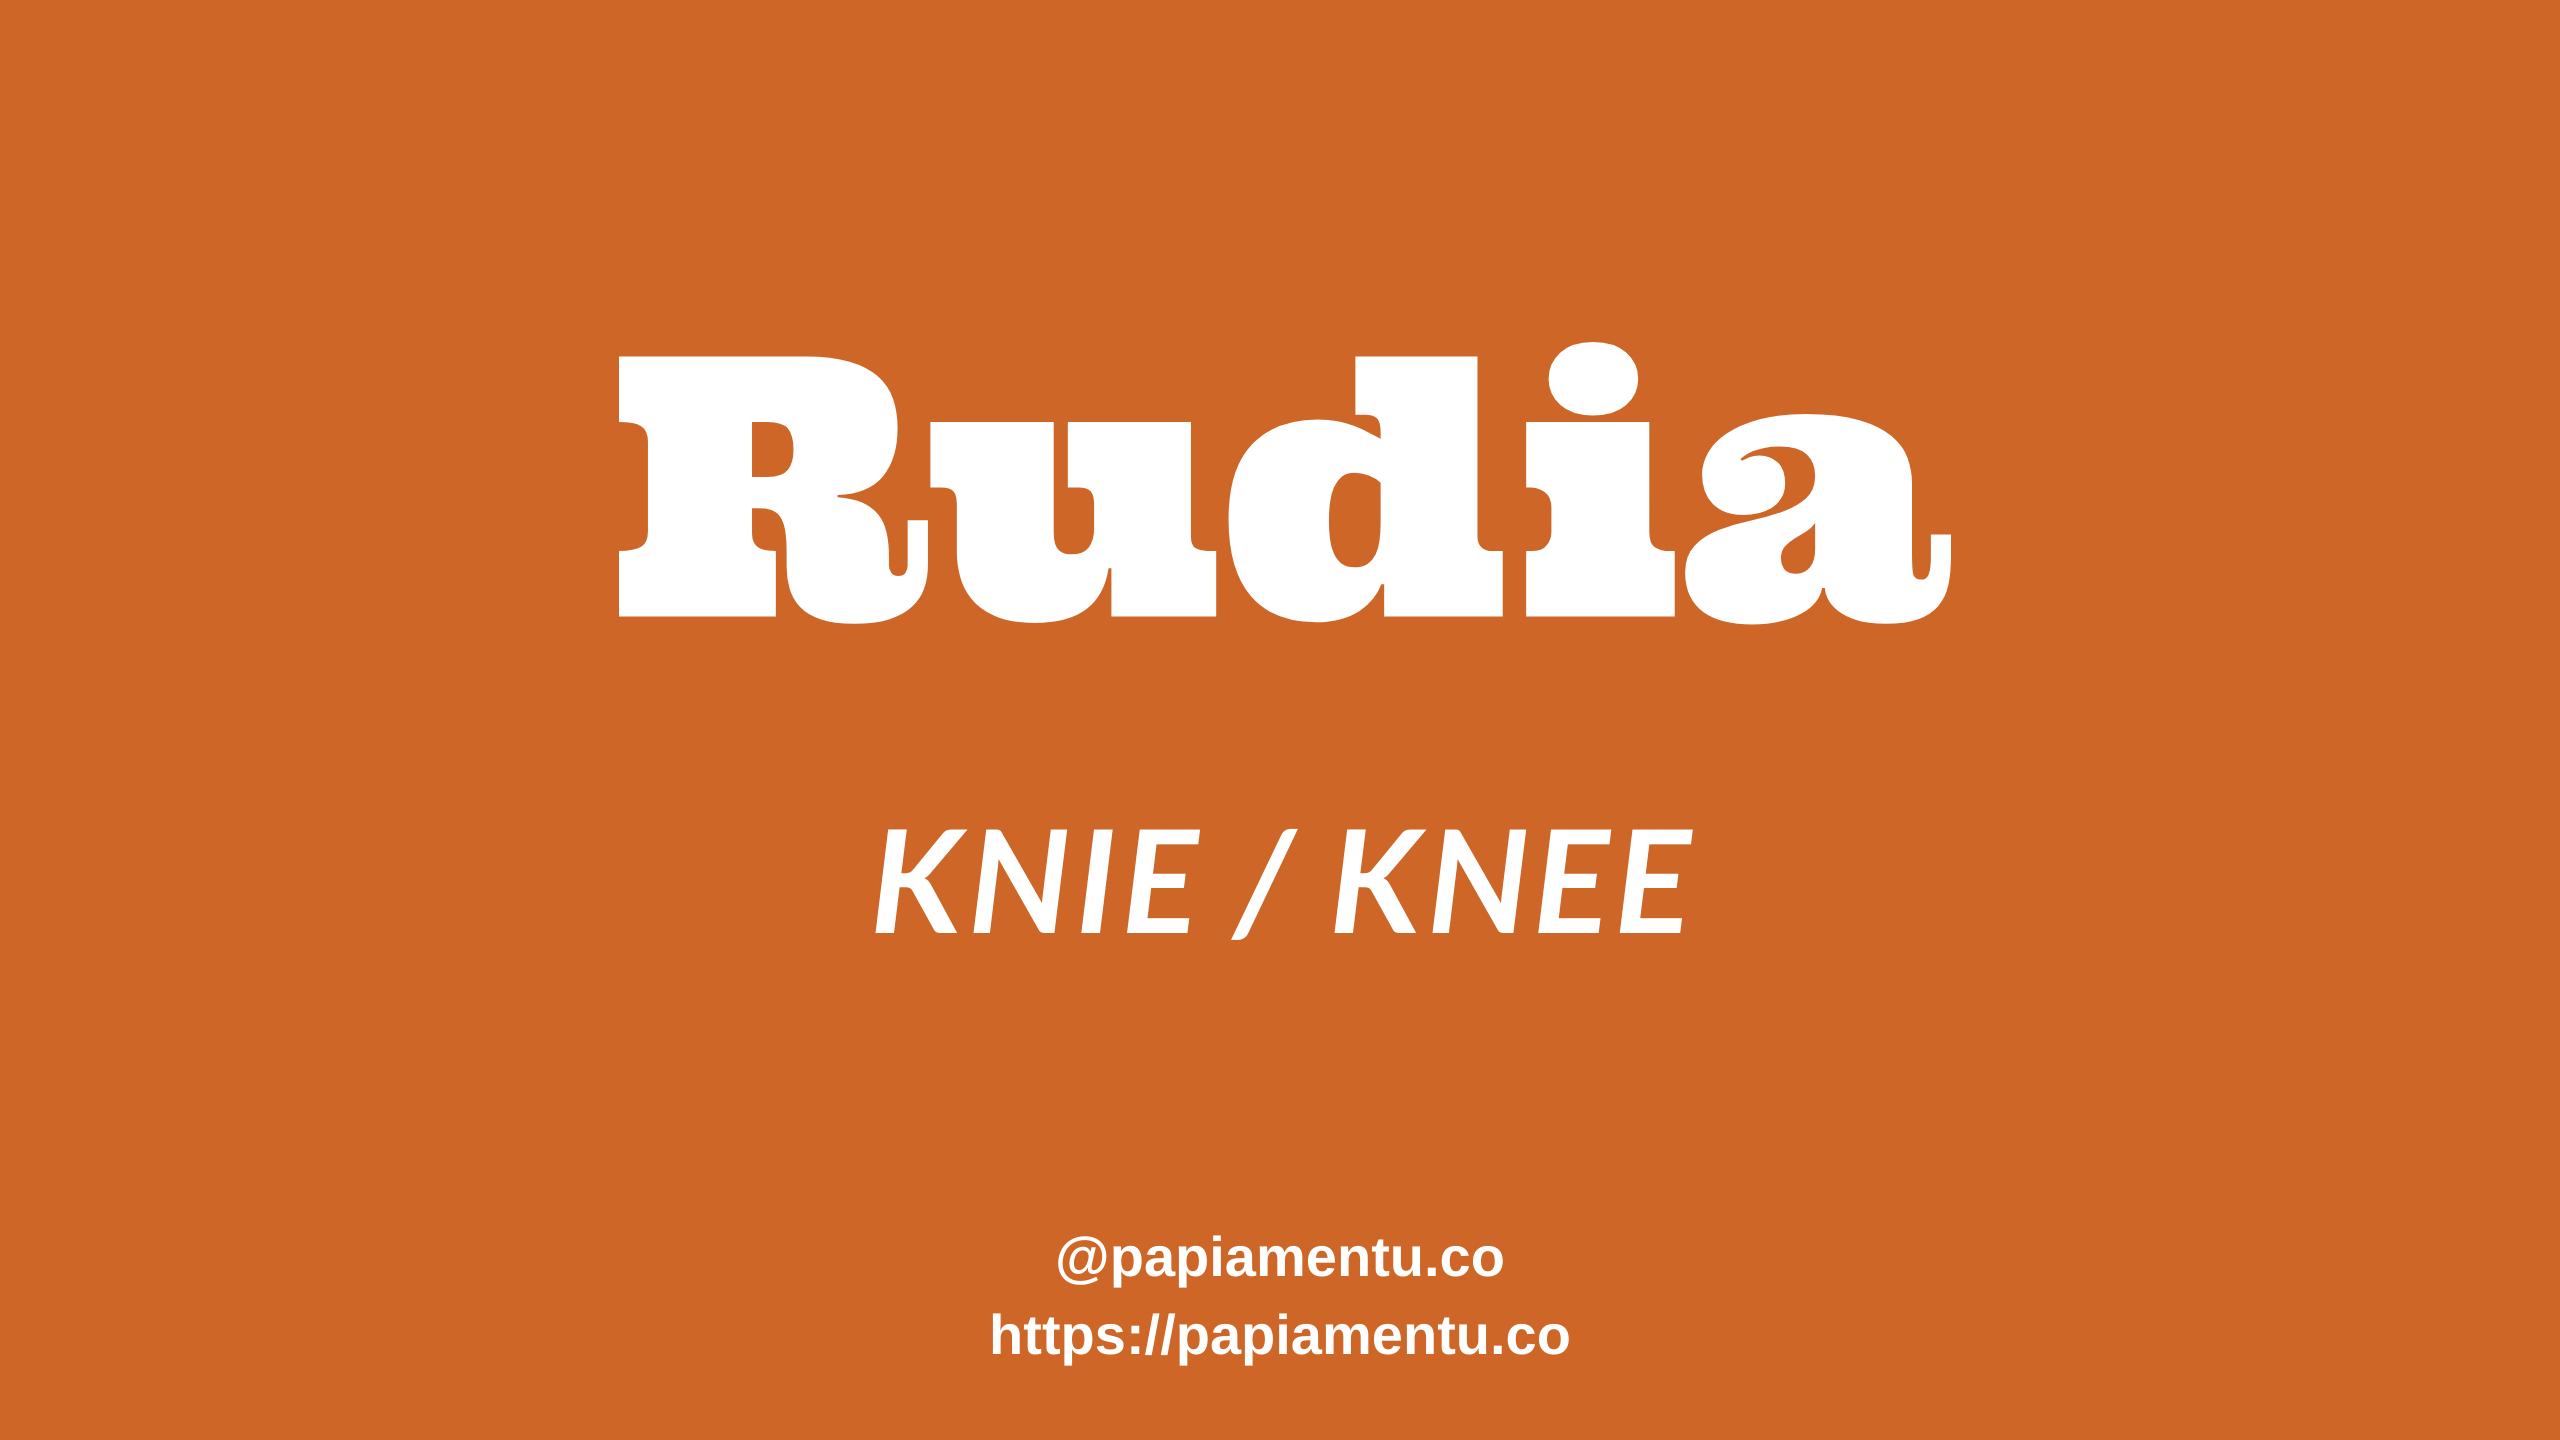 Knie in het papiaments, rudia